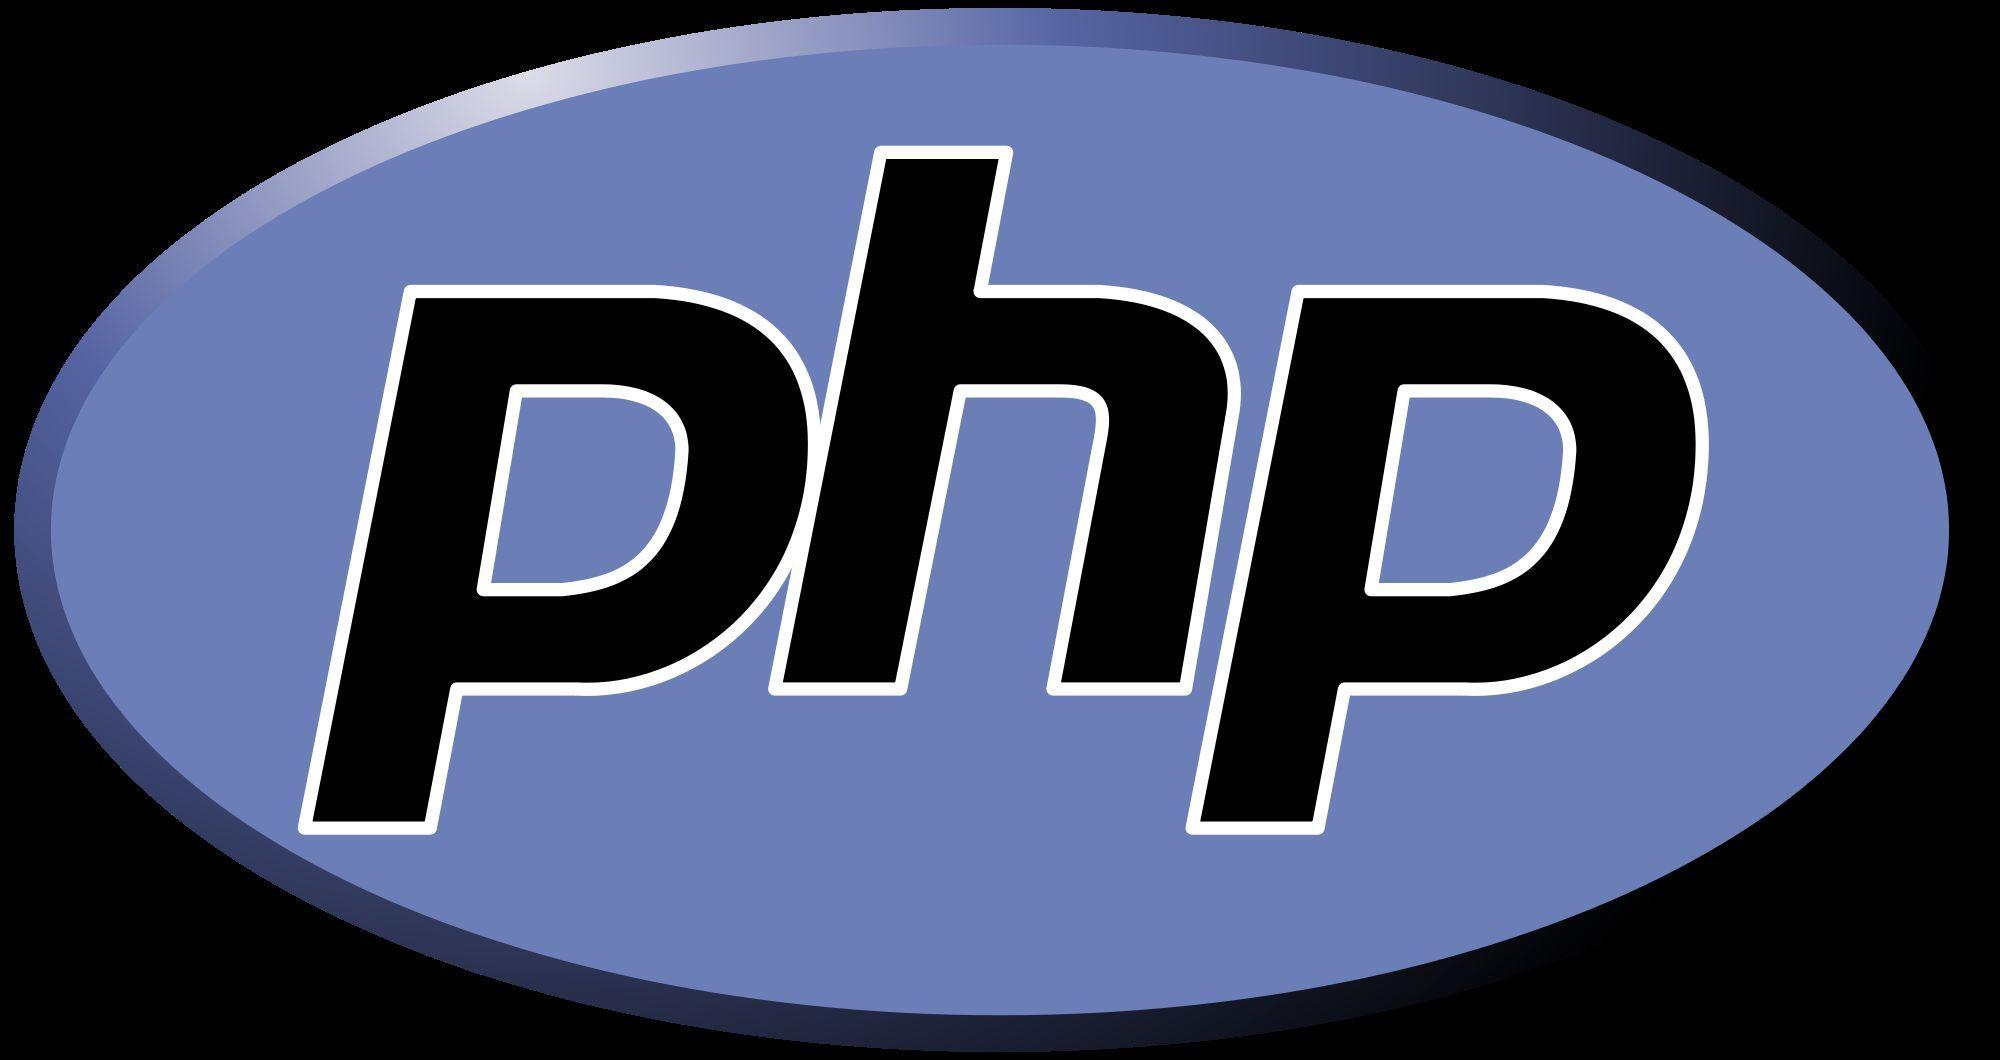 10110 - ¿Cuánto sabes de programación en PHP? [Nivel Medio/Difícil]